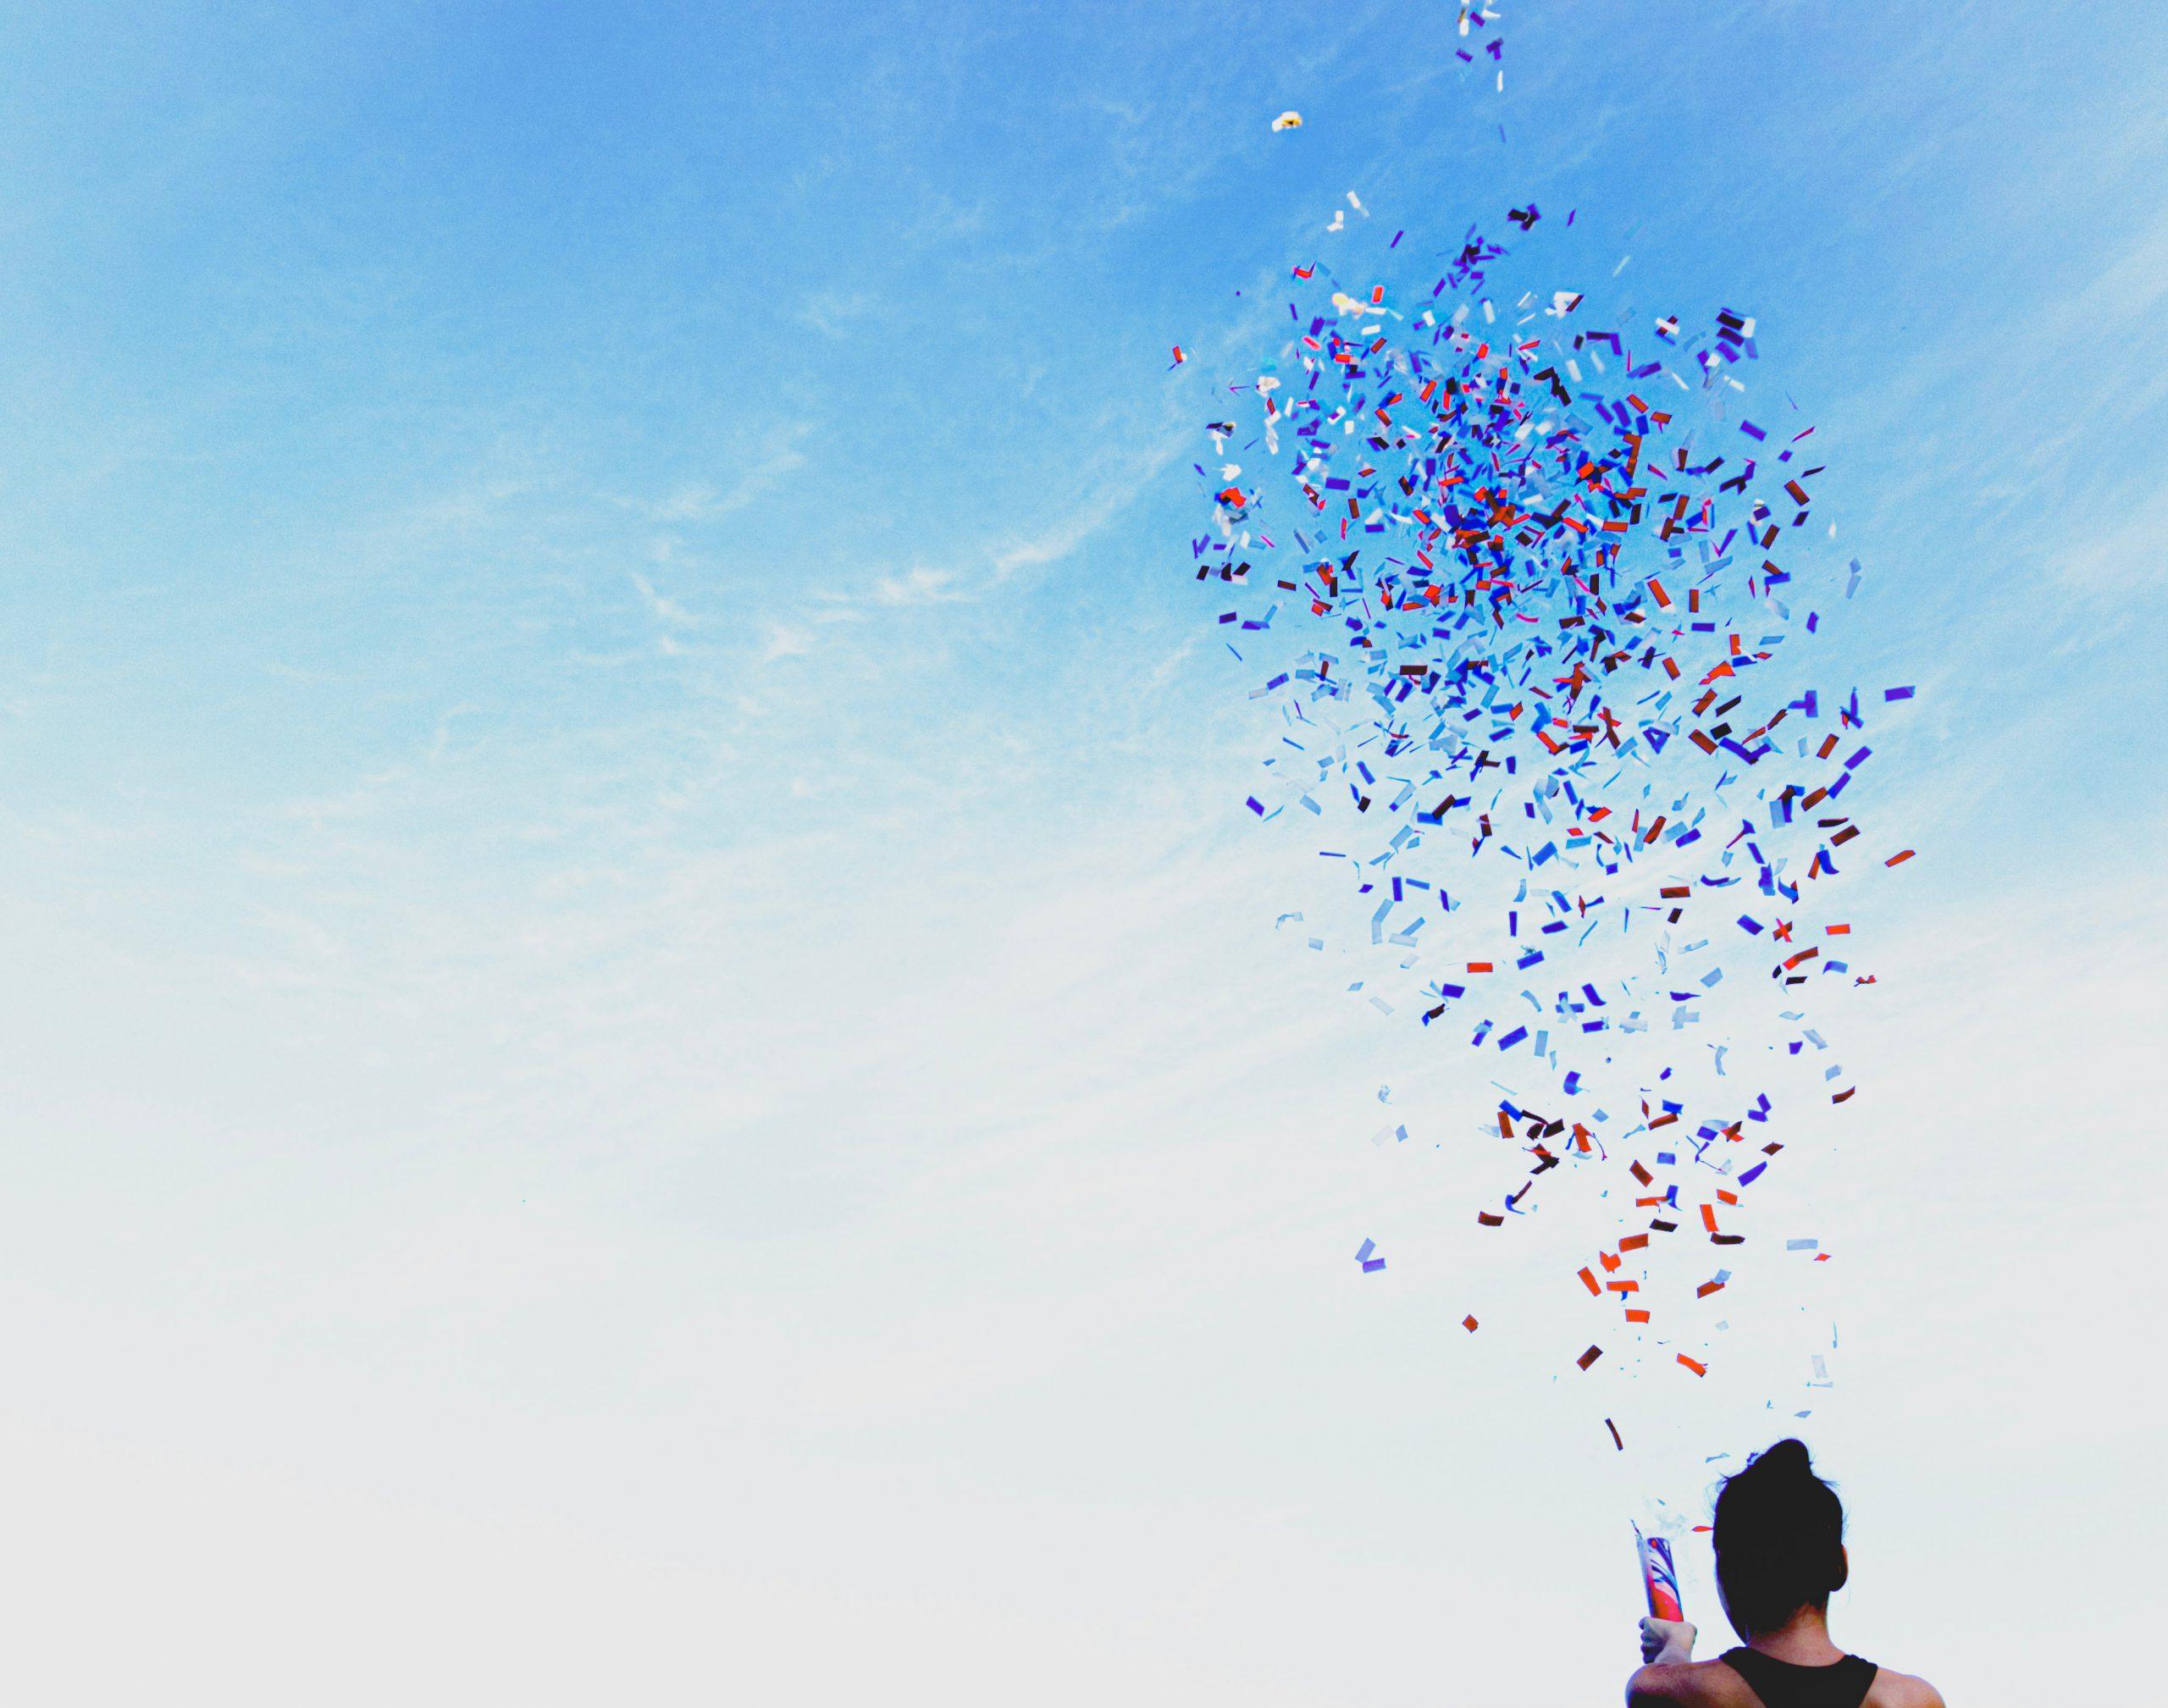 Celebrating blogpost